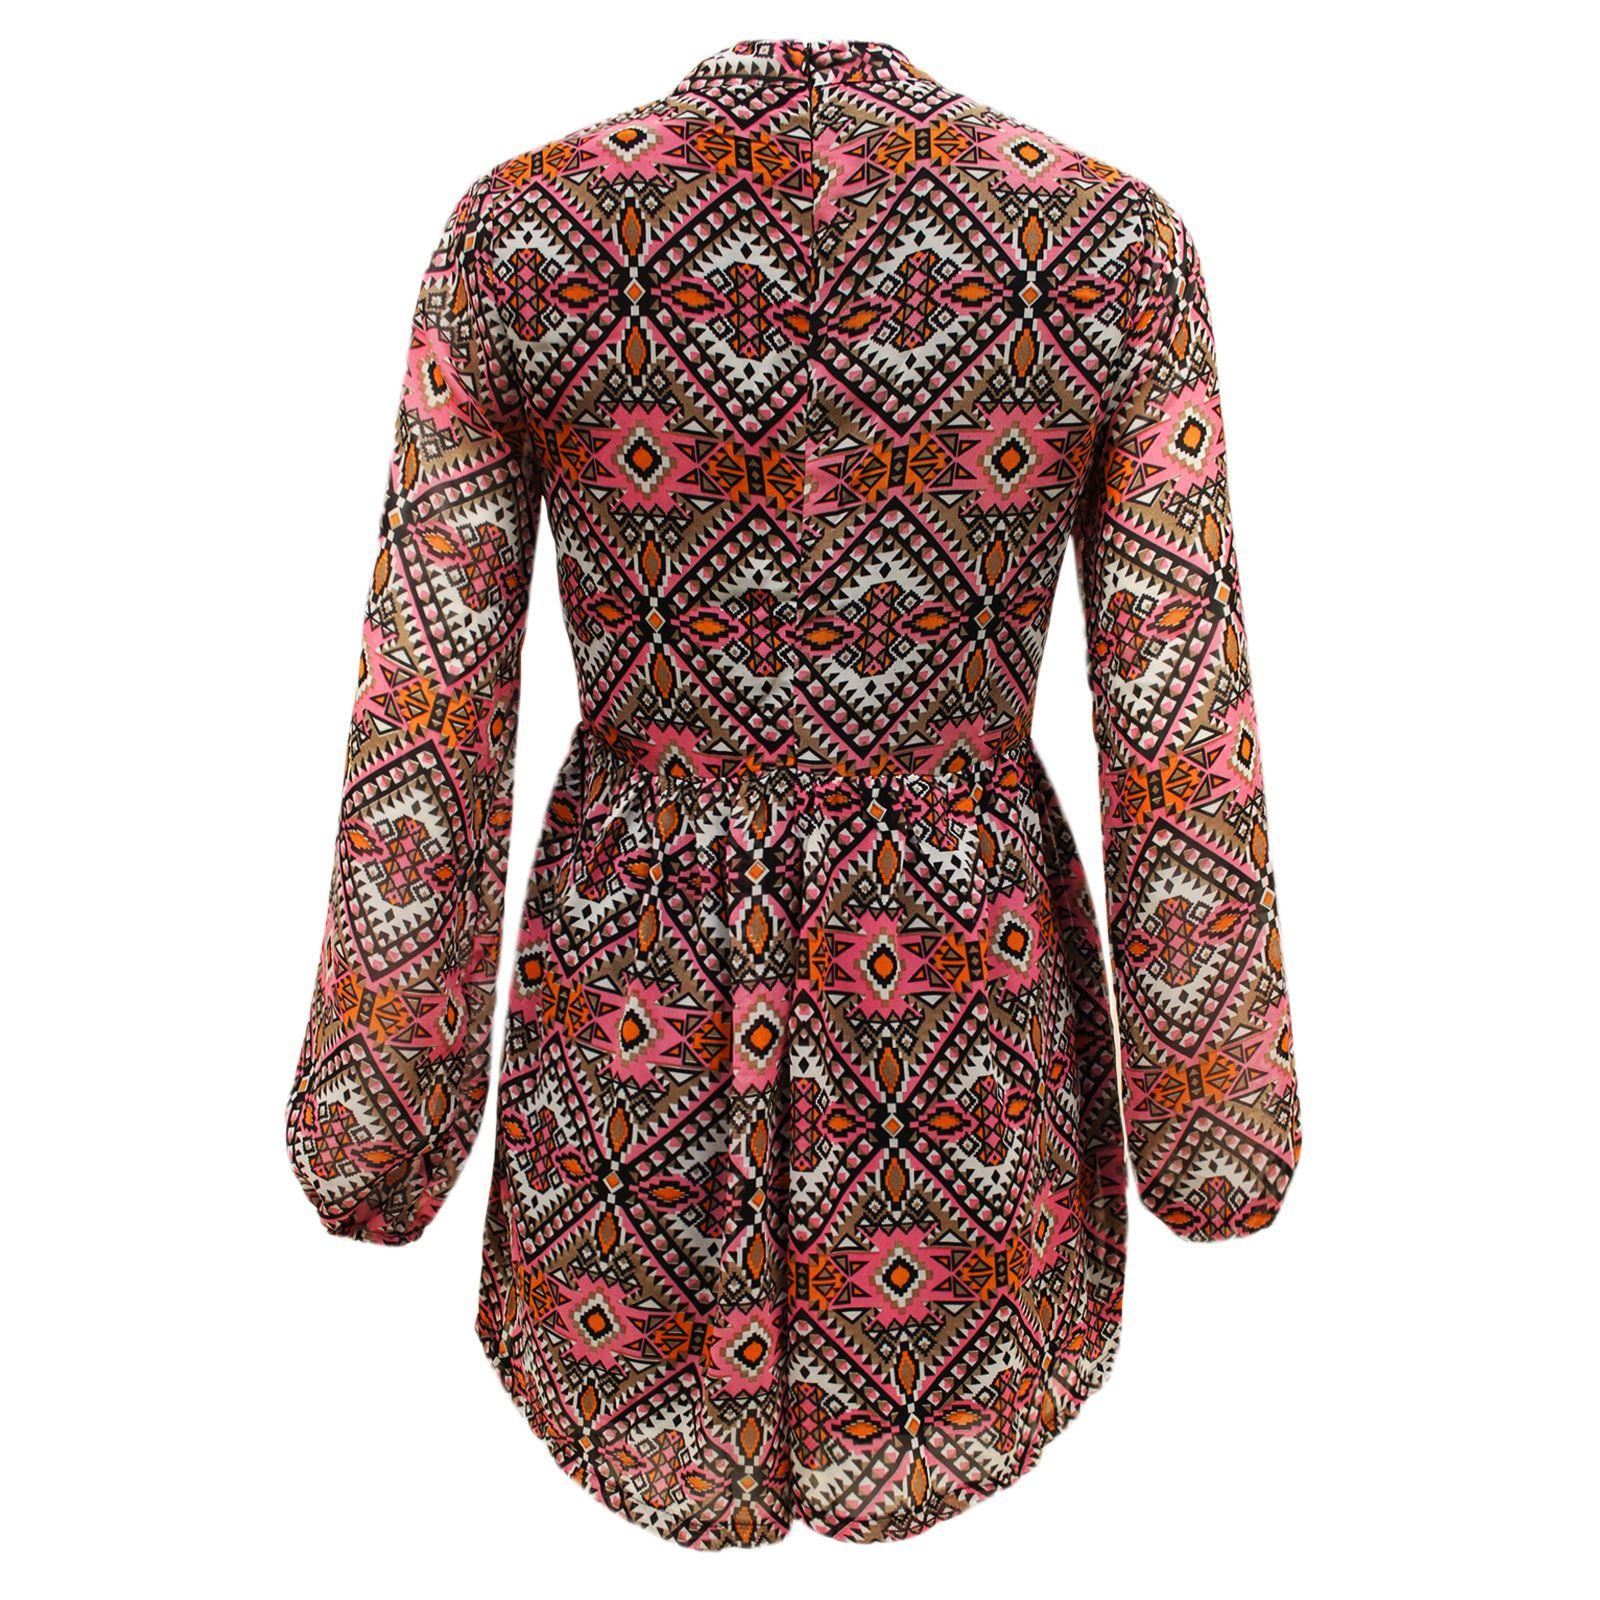 Womens Ladies Chiffon Tribal Print Long Sleeve Short Playsuit Jumpsuit Dress Top